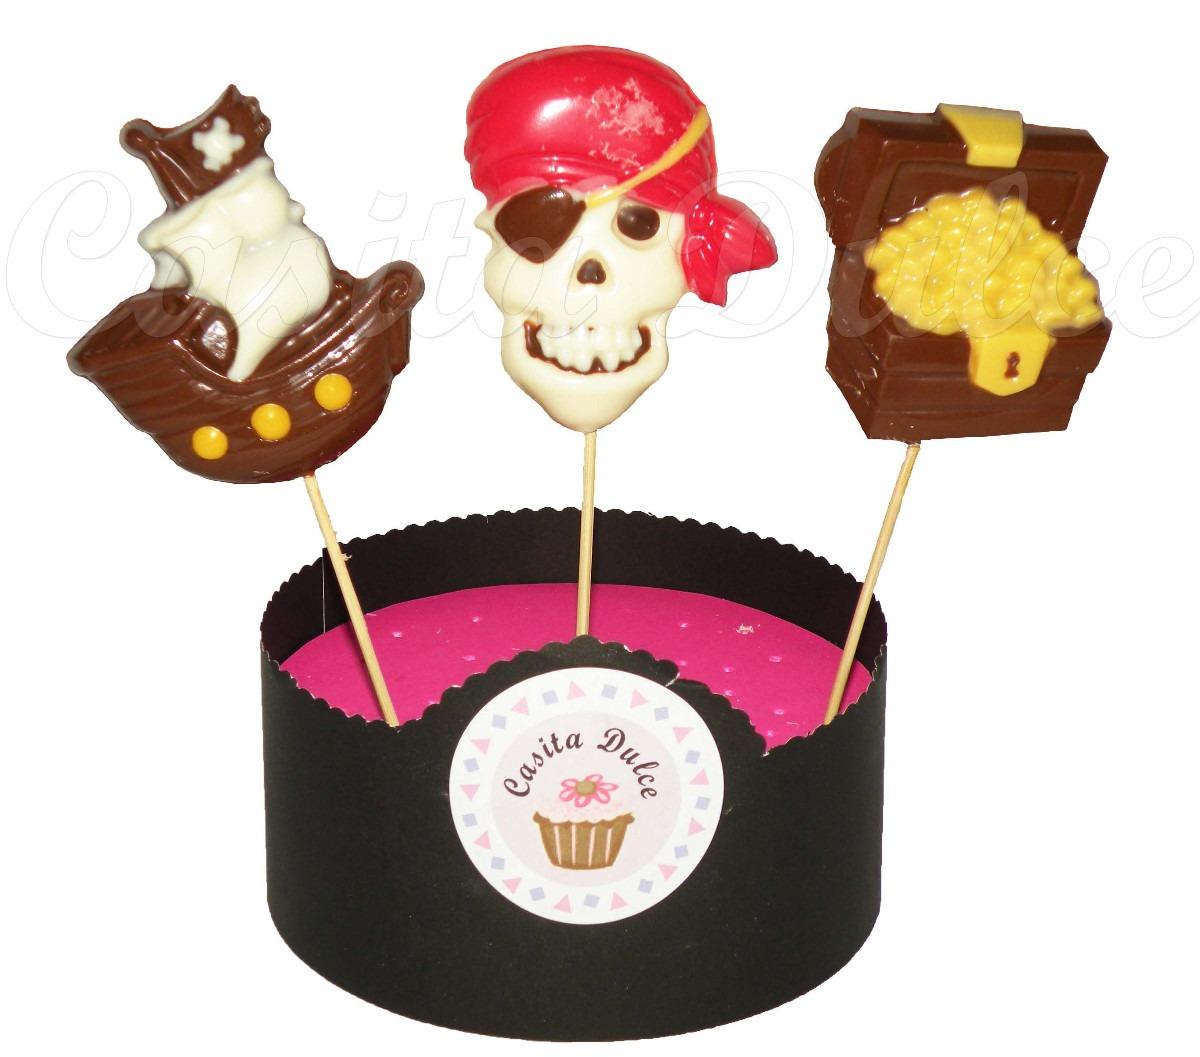 10 Chupetines De Chocolate Piratas Barco Calavera Exclusivos 450